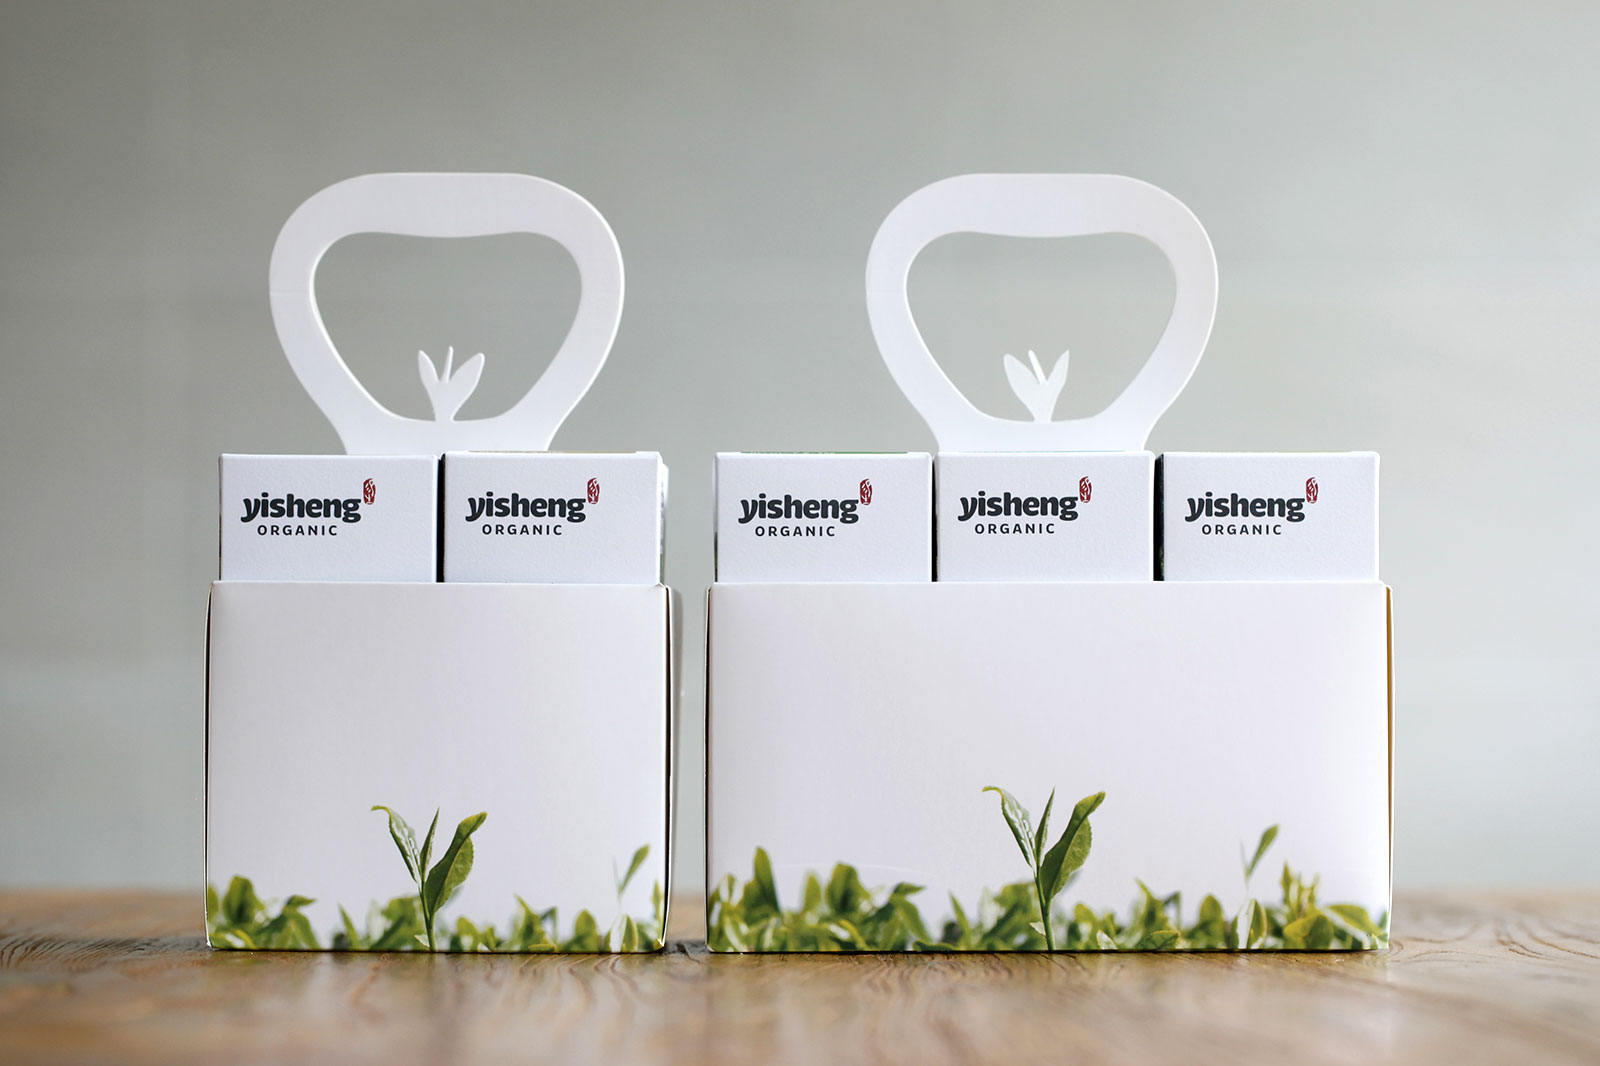 yisheng-packaging-02.jpg